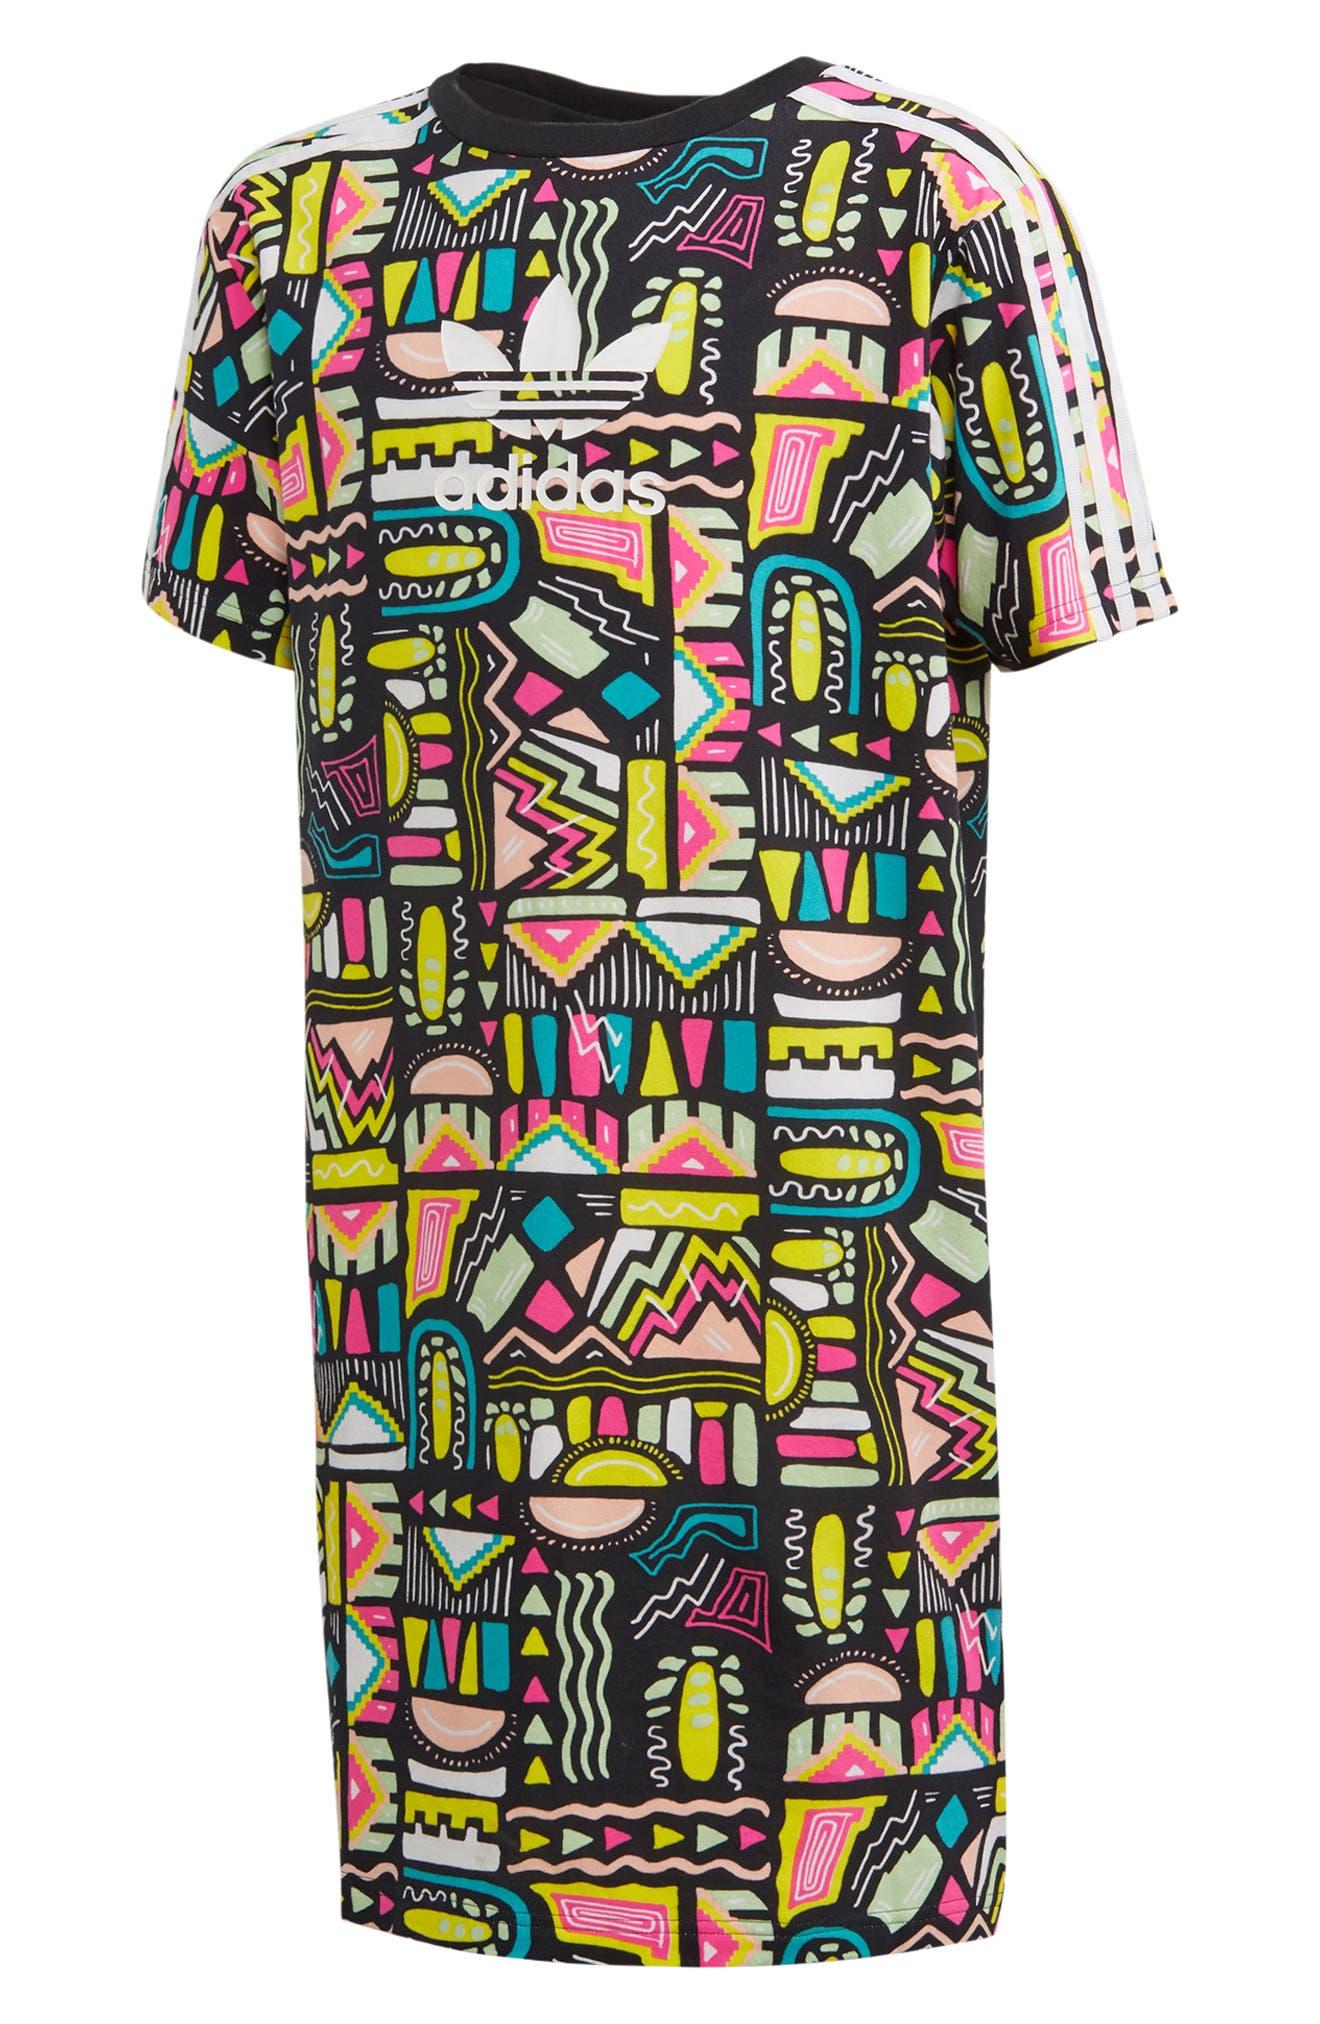 60s 70s Kids Costumes & Clothing Girls & Boys Girls Adidas Logo Graphic T-Shirt Dress $40.00 AT vintagedancer.com